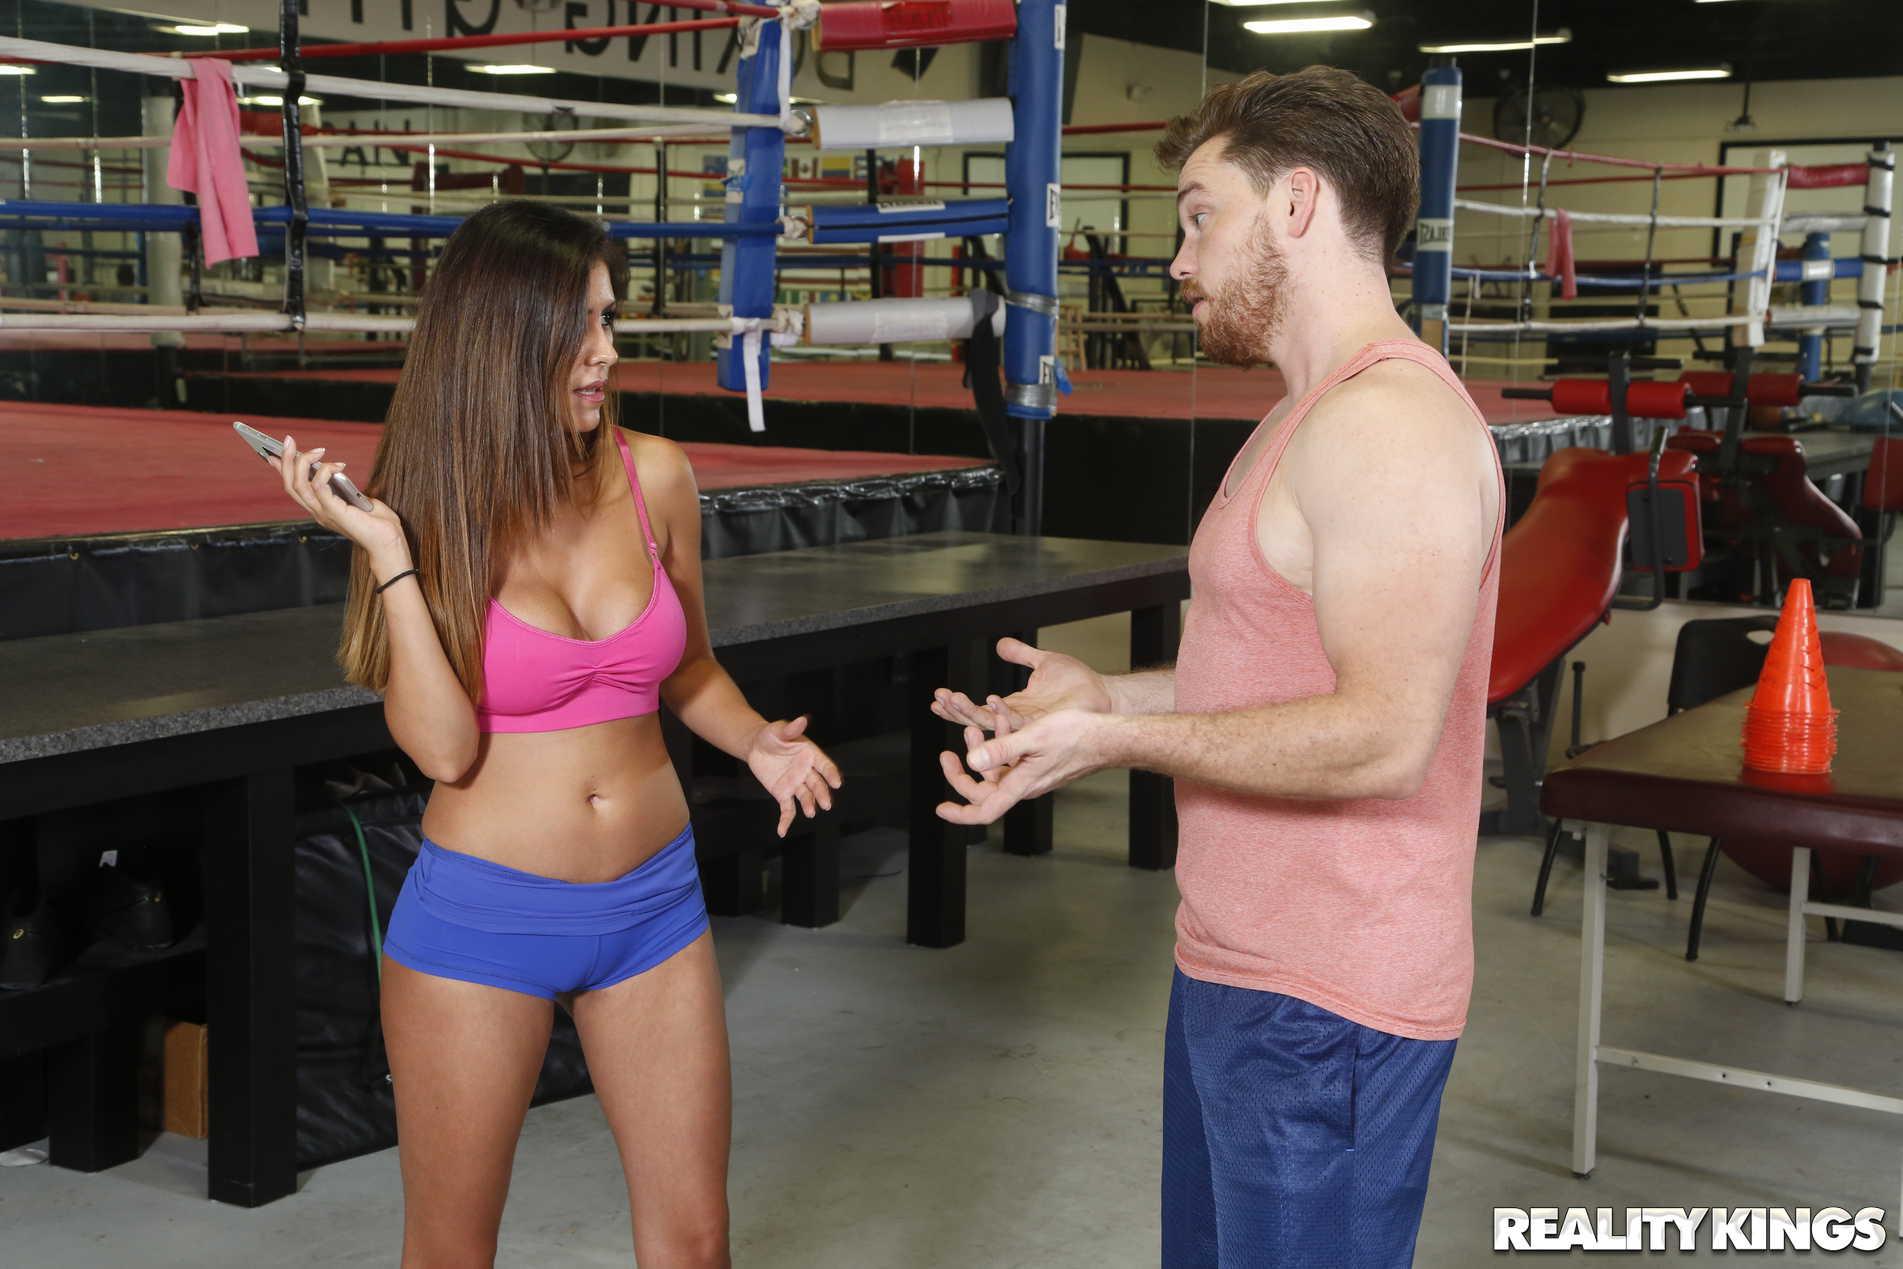 Reality Kings 'Slut Sweat And Tears' starring Alexxa Vega (Photo 24)